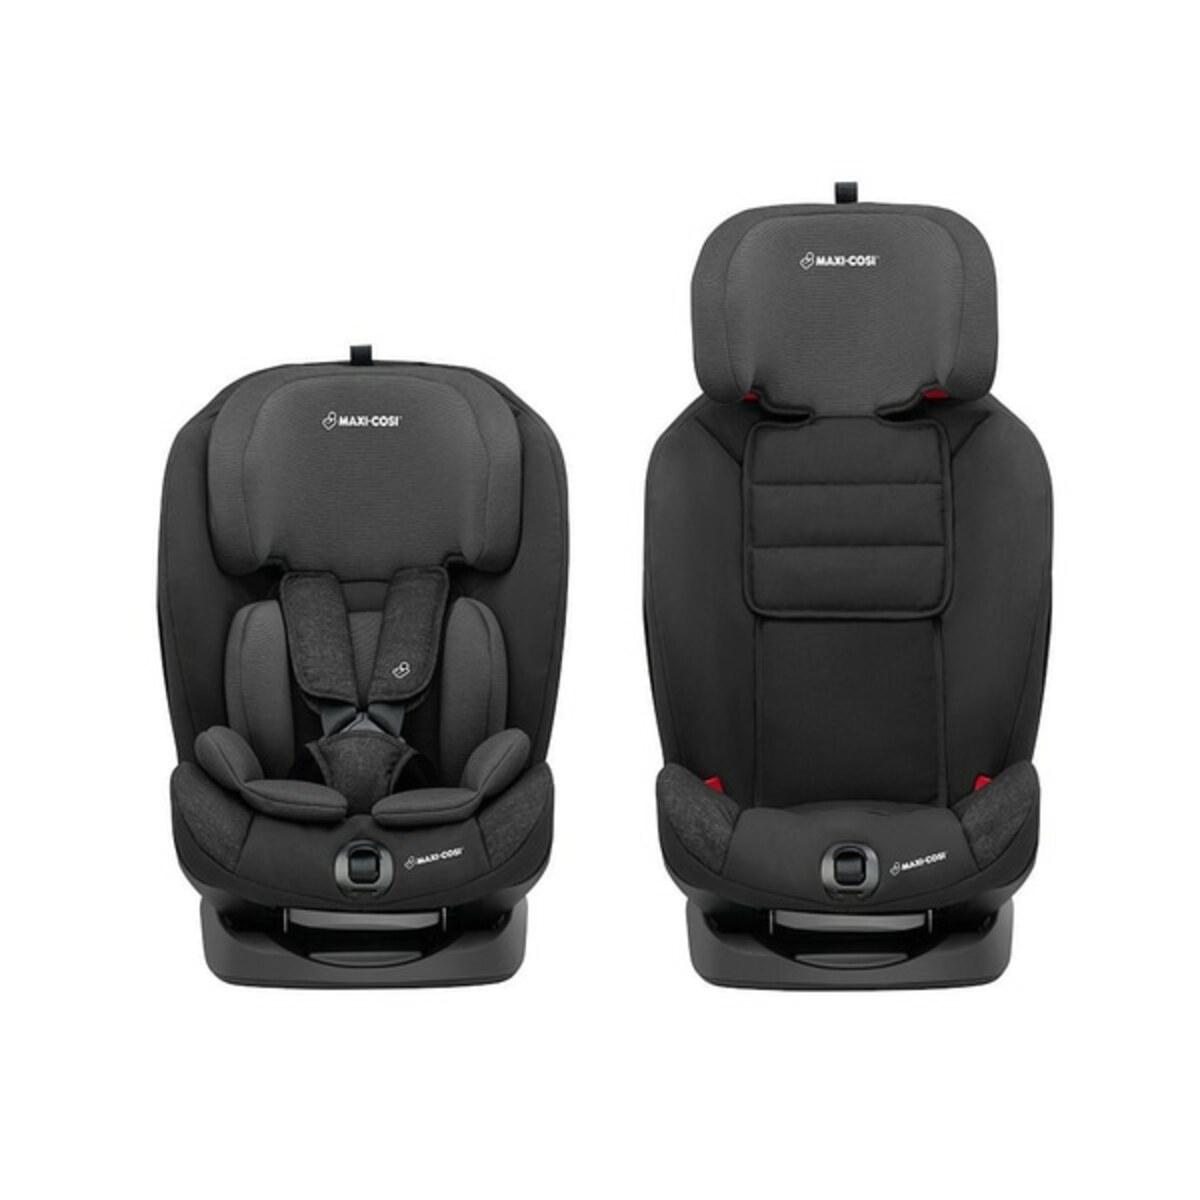 Bild 2 von Maxi-Cosi - Kindersitz Titan, Nomad Black